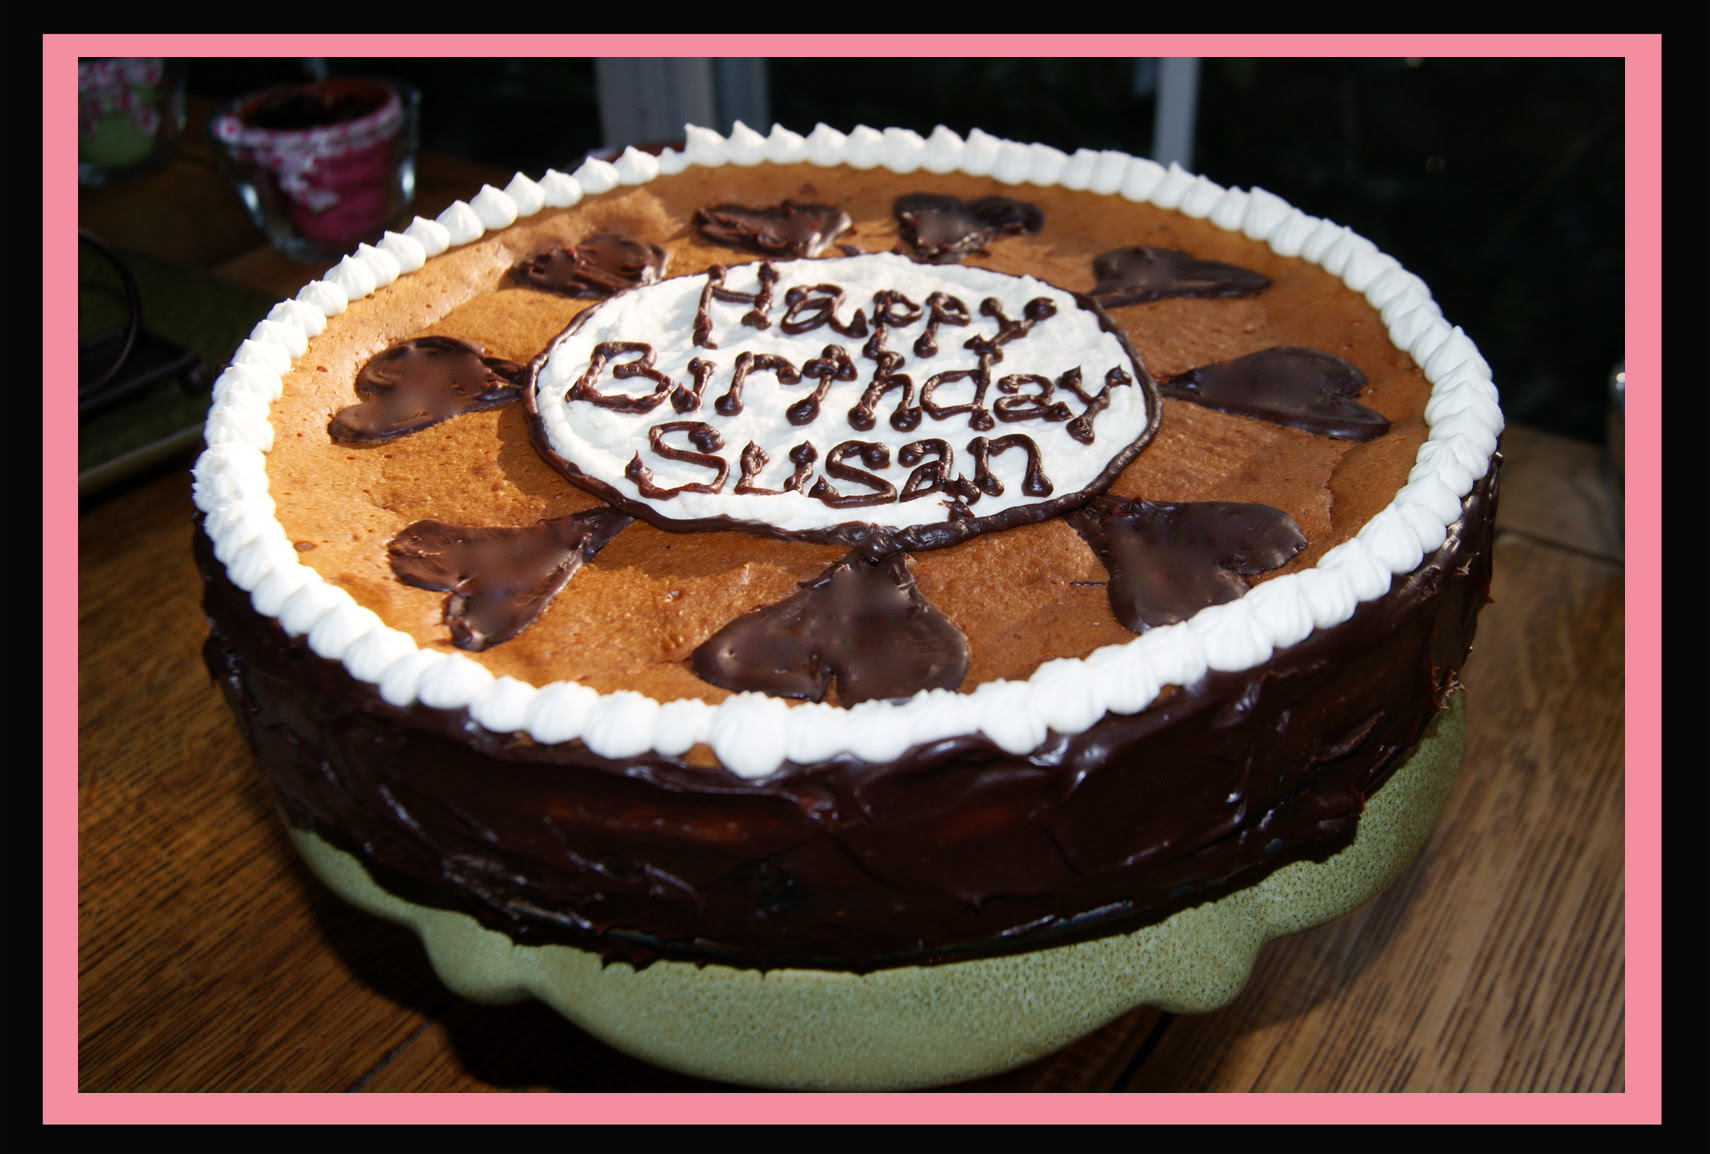 Susans Triple Decker Cheesecake